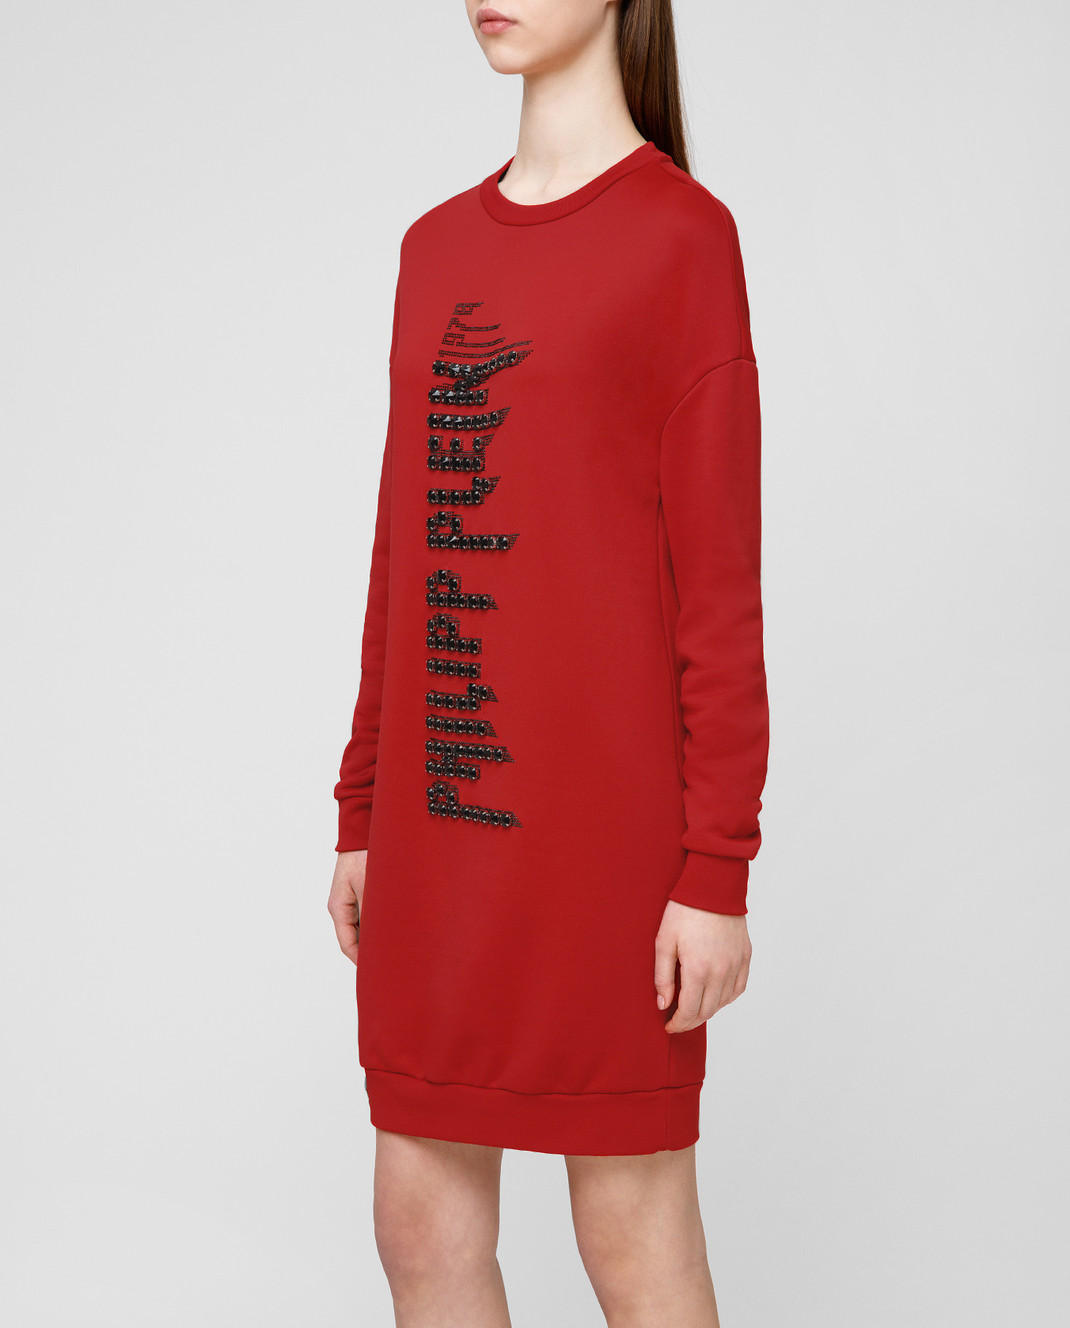 Philipp Plein Красное платье WJO0373 изображение 3